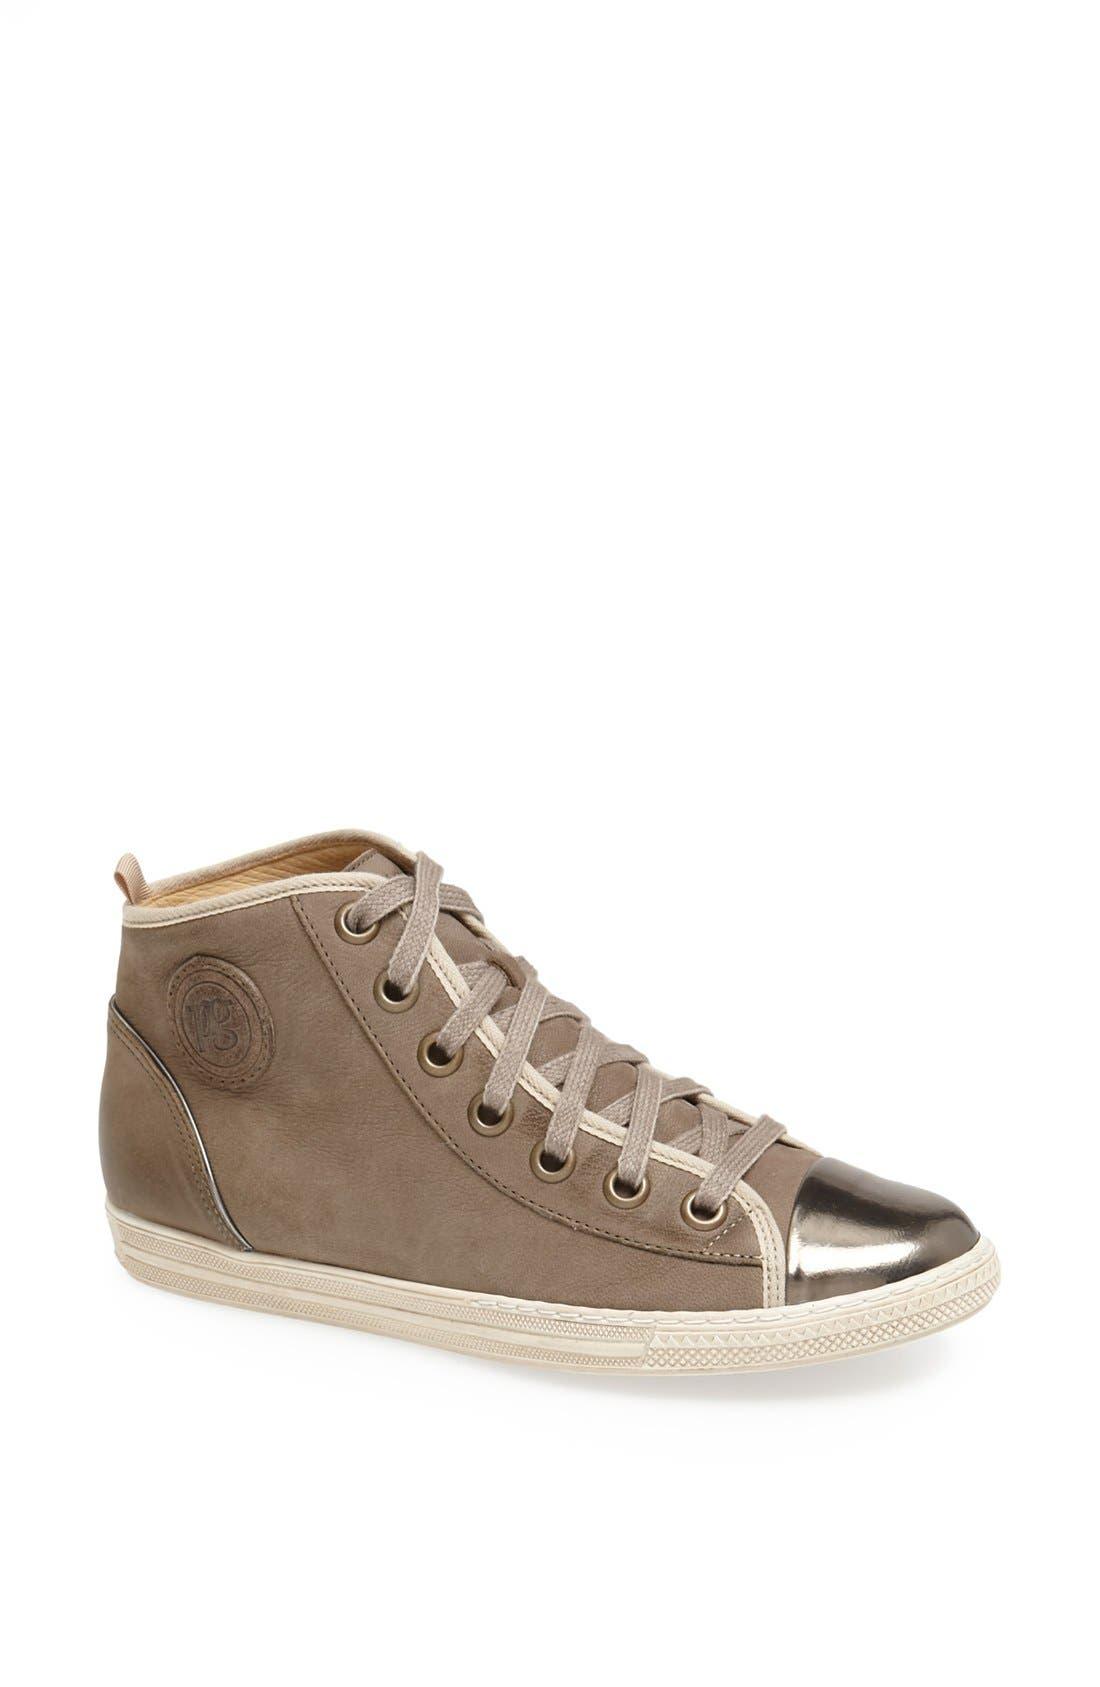 Main Image - Paul Green 'Valetta' Sneaker